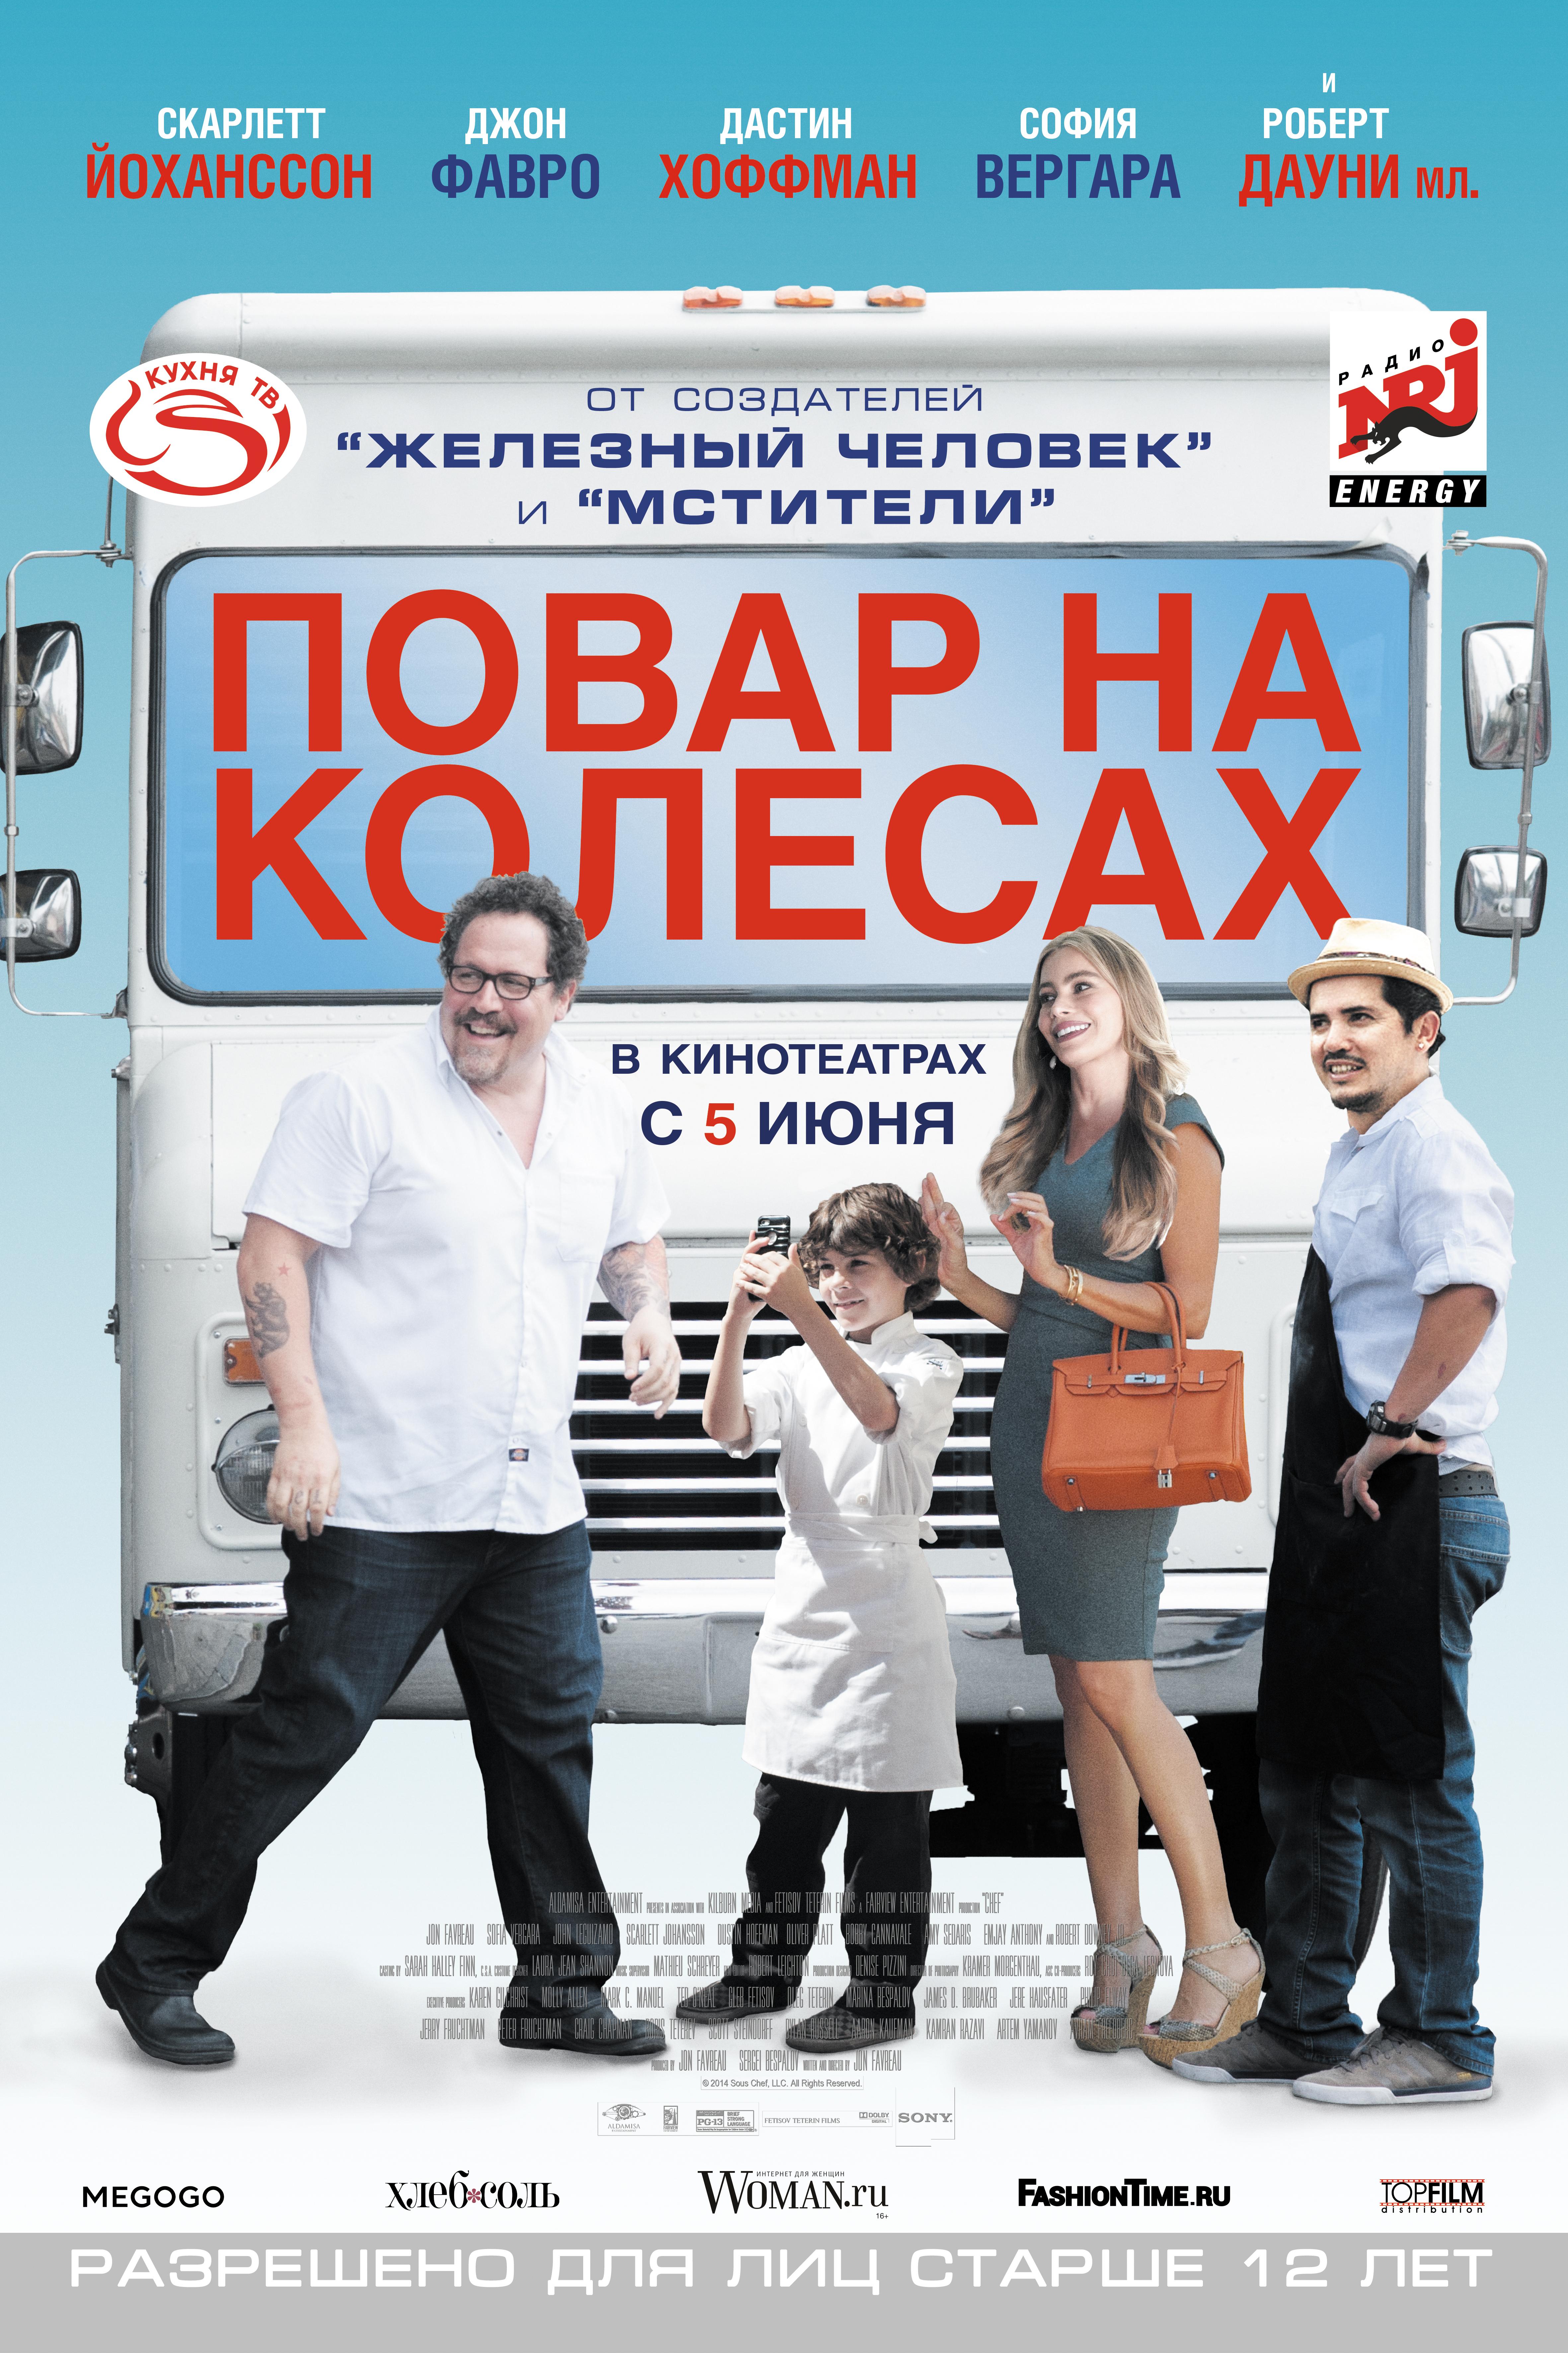 Постер повар на колесах